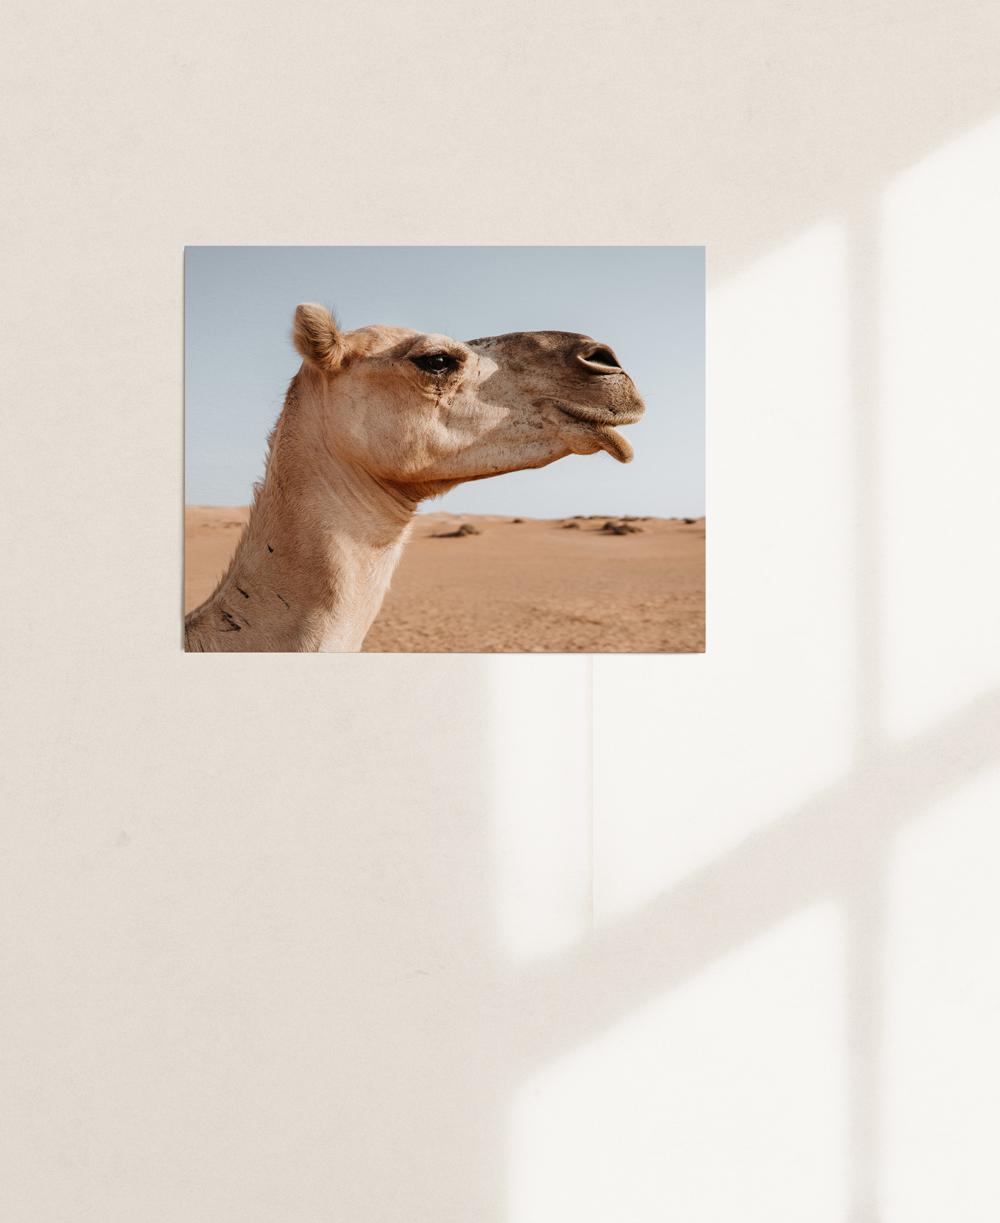 nicischwab-prints-02-015